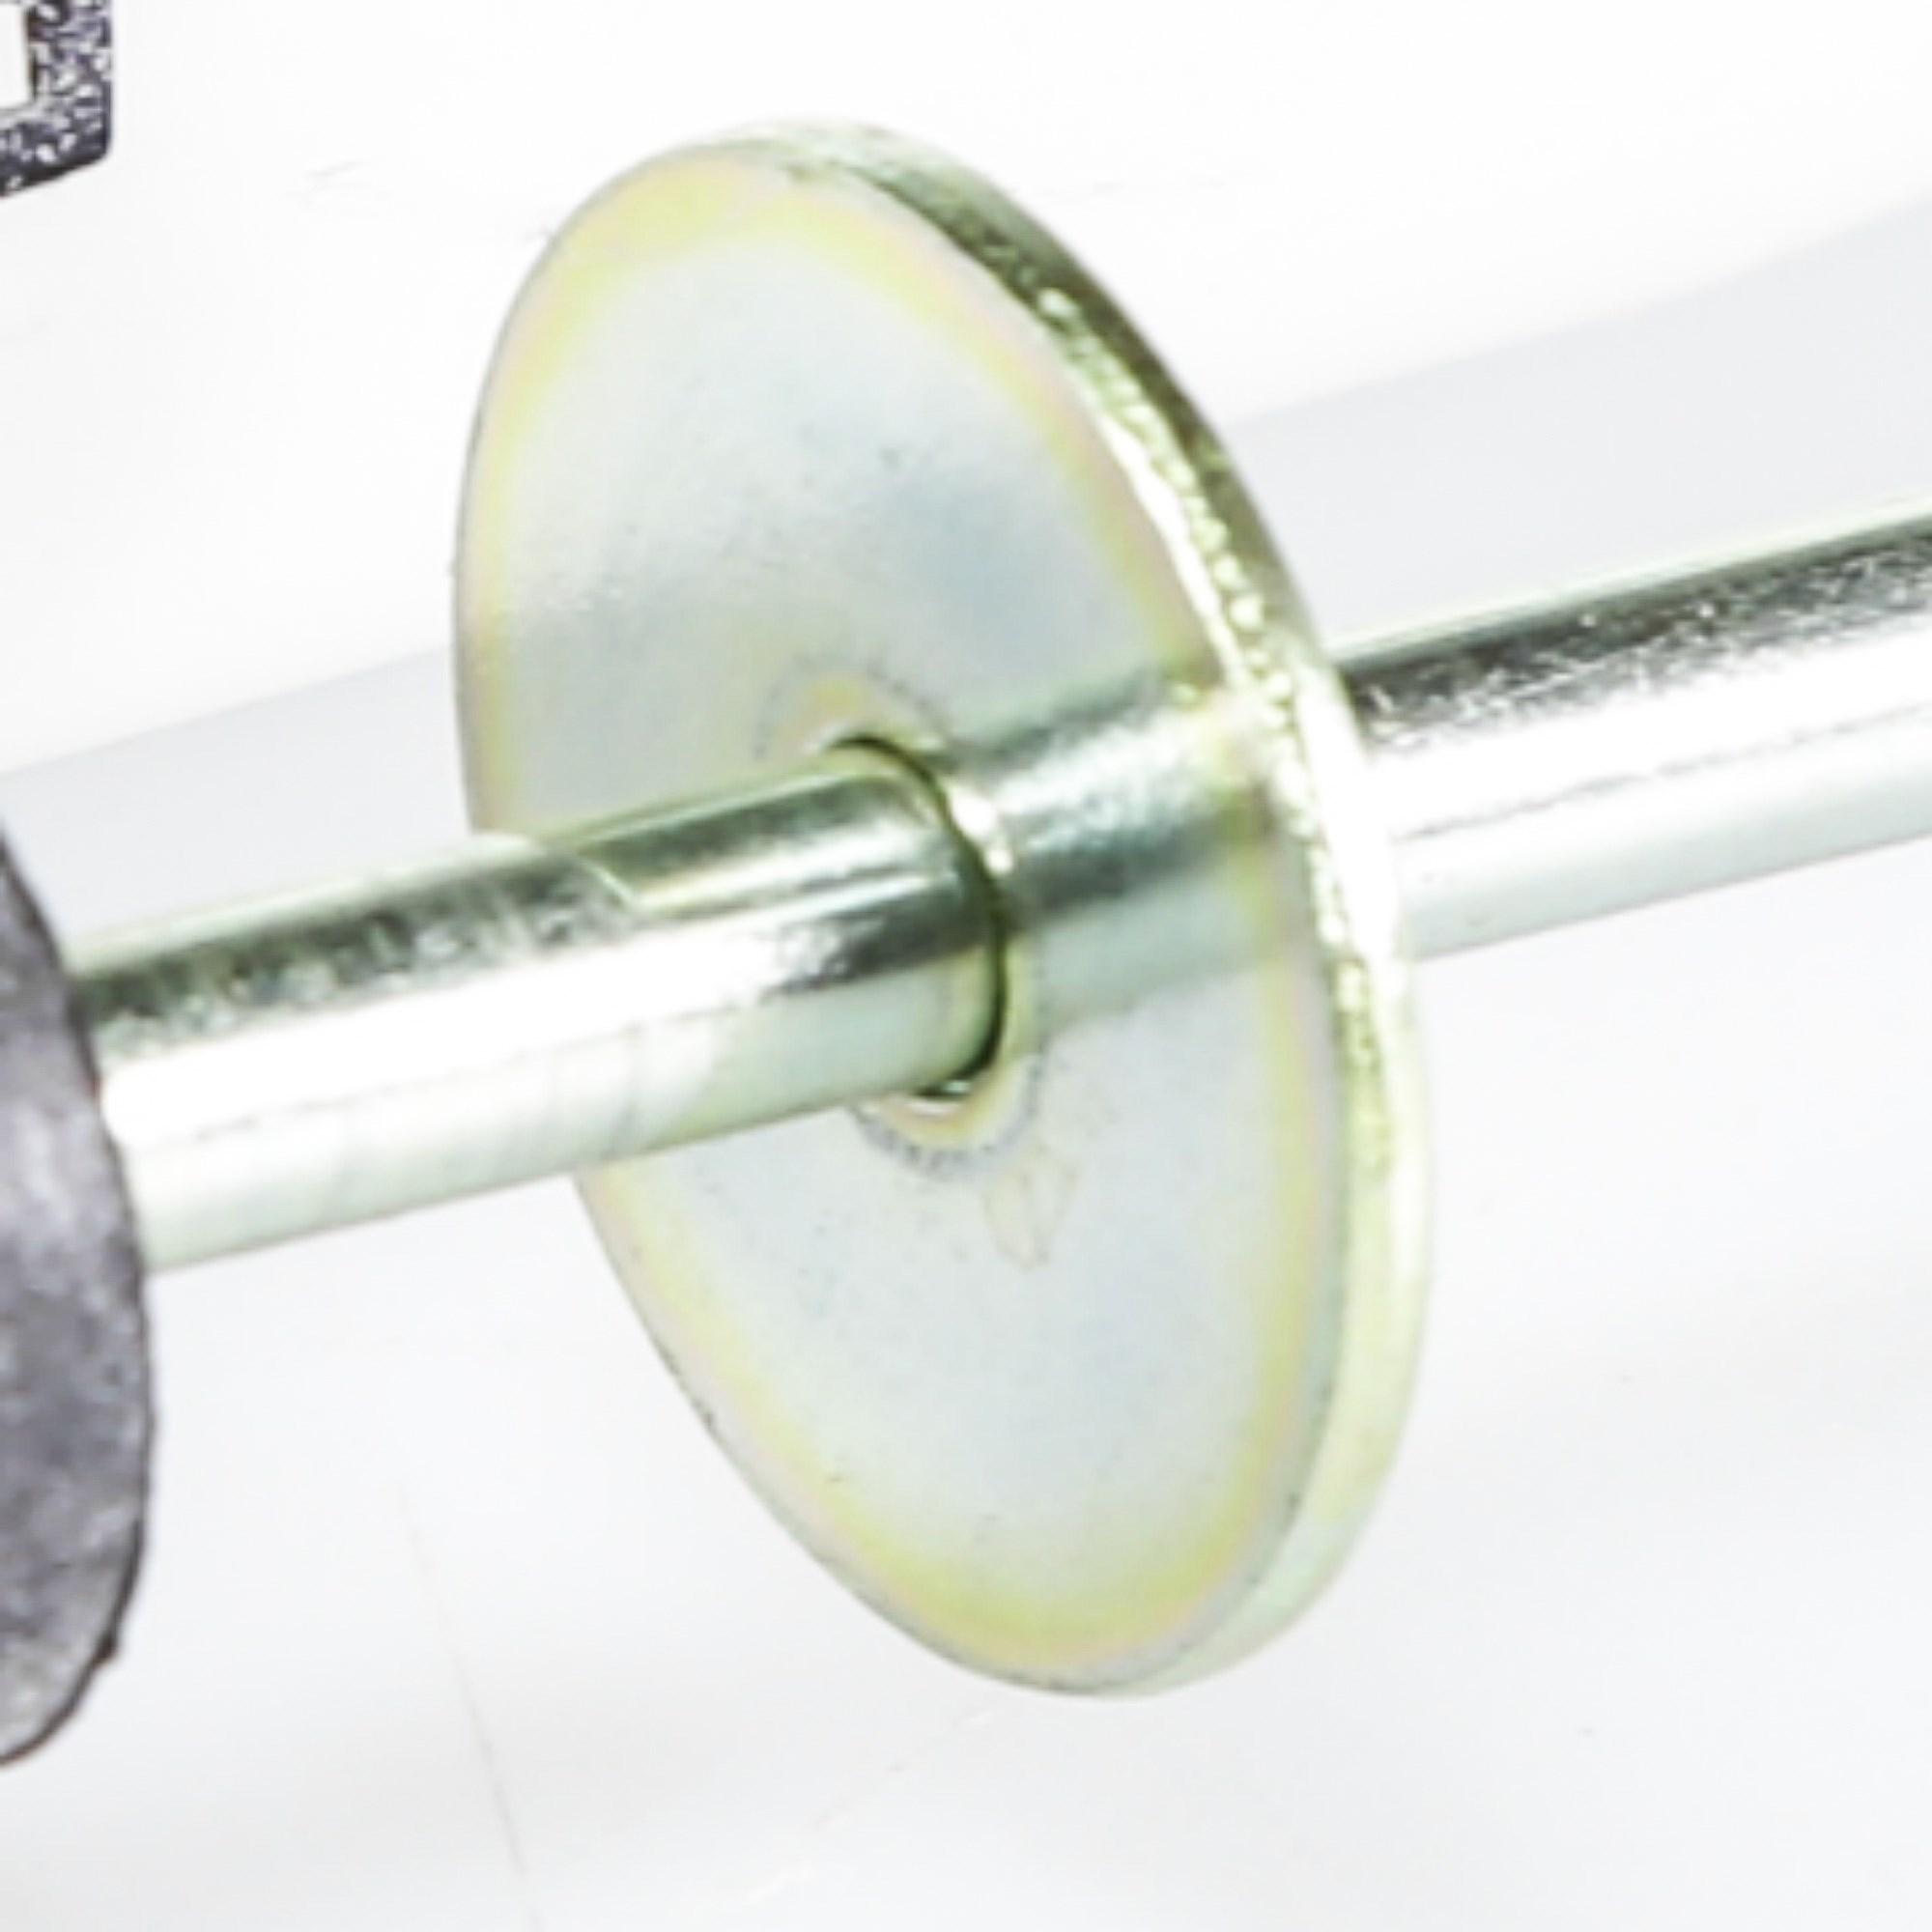 AJK72909307 suspension kit Lg Washer